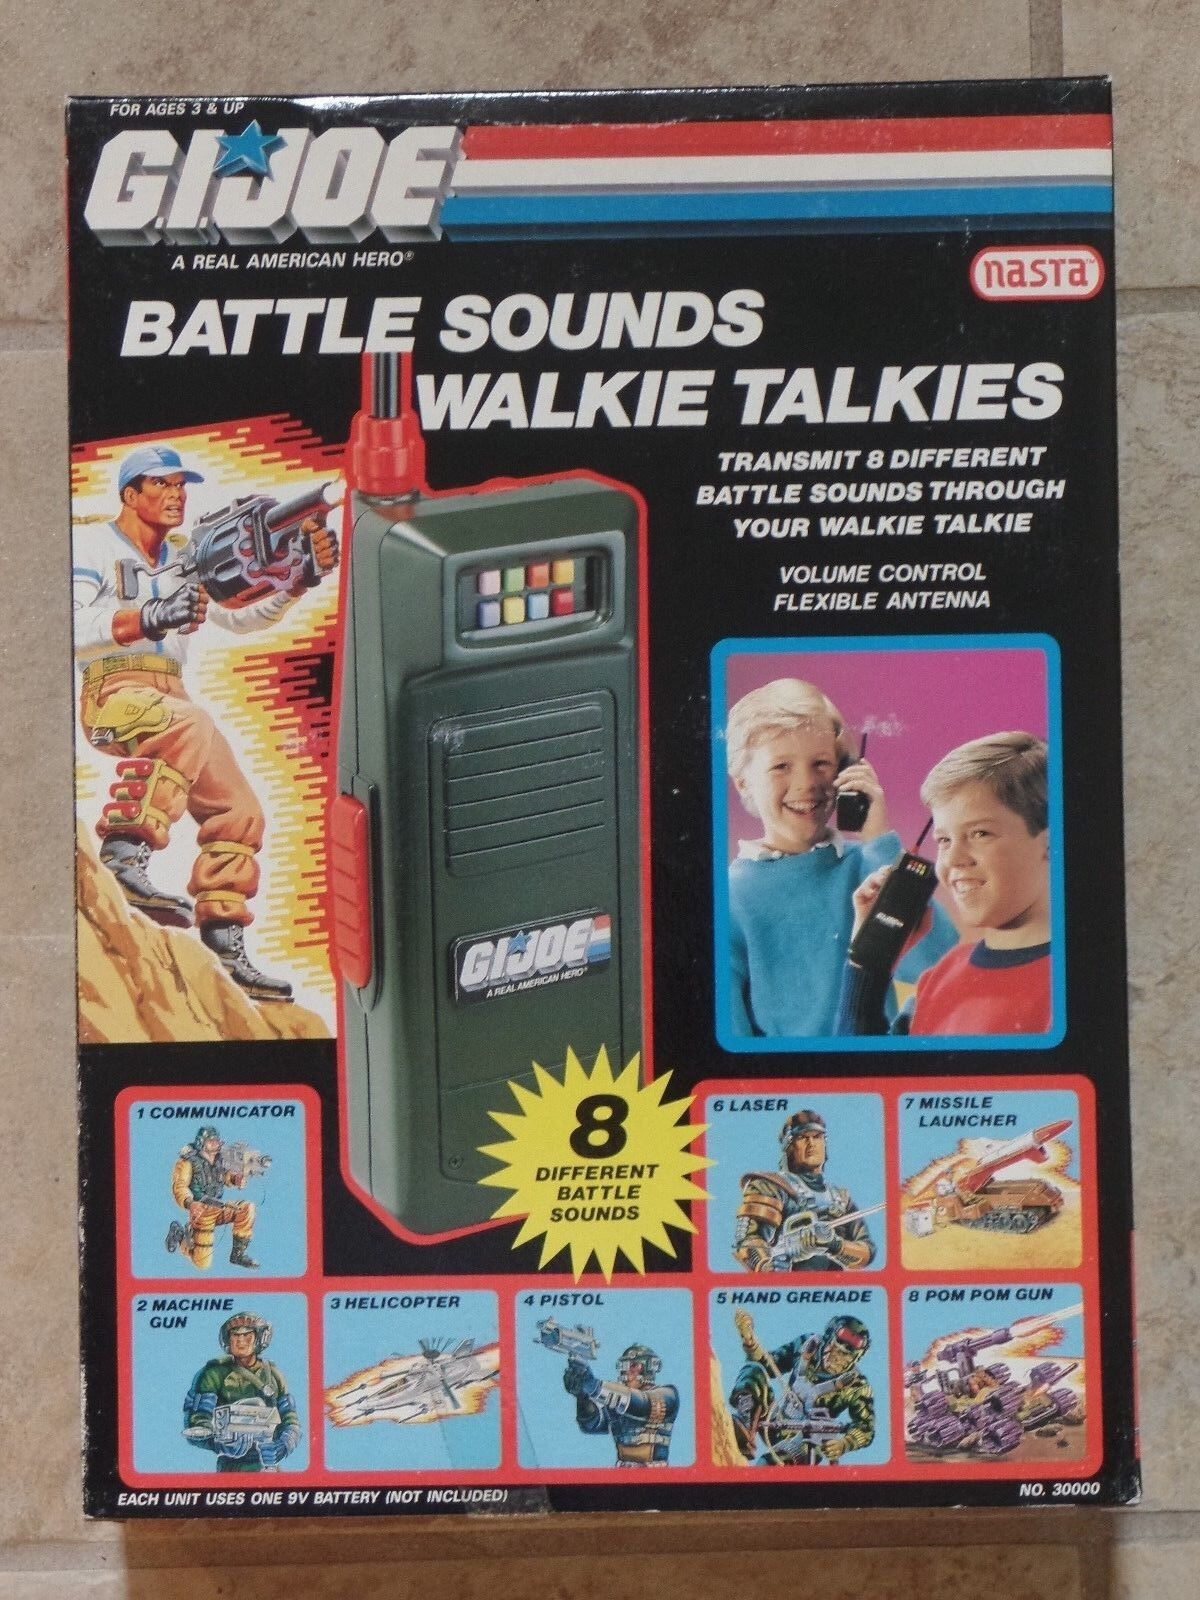 GI Joe Battle Sounds Walkie Talkies NEW Sealed Box Hasbro Nasta 1990